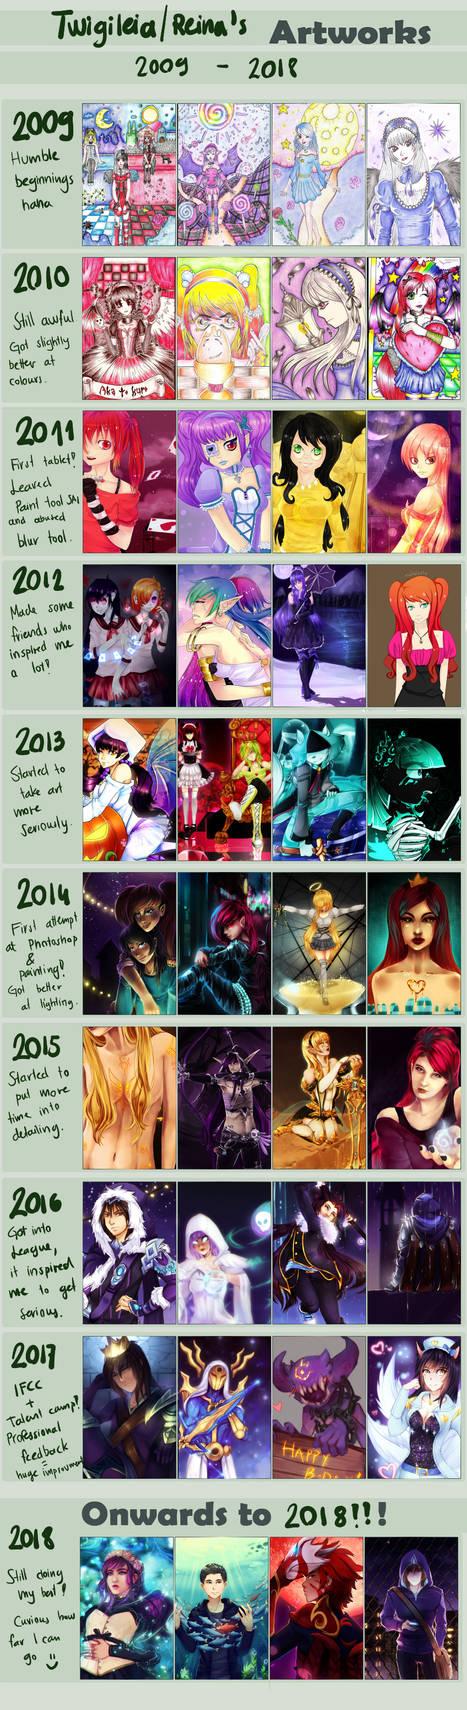 2009-2018 progress / improvement